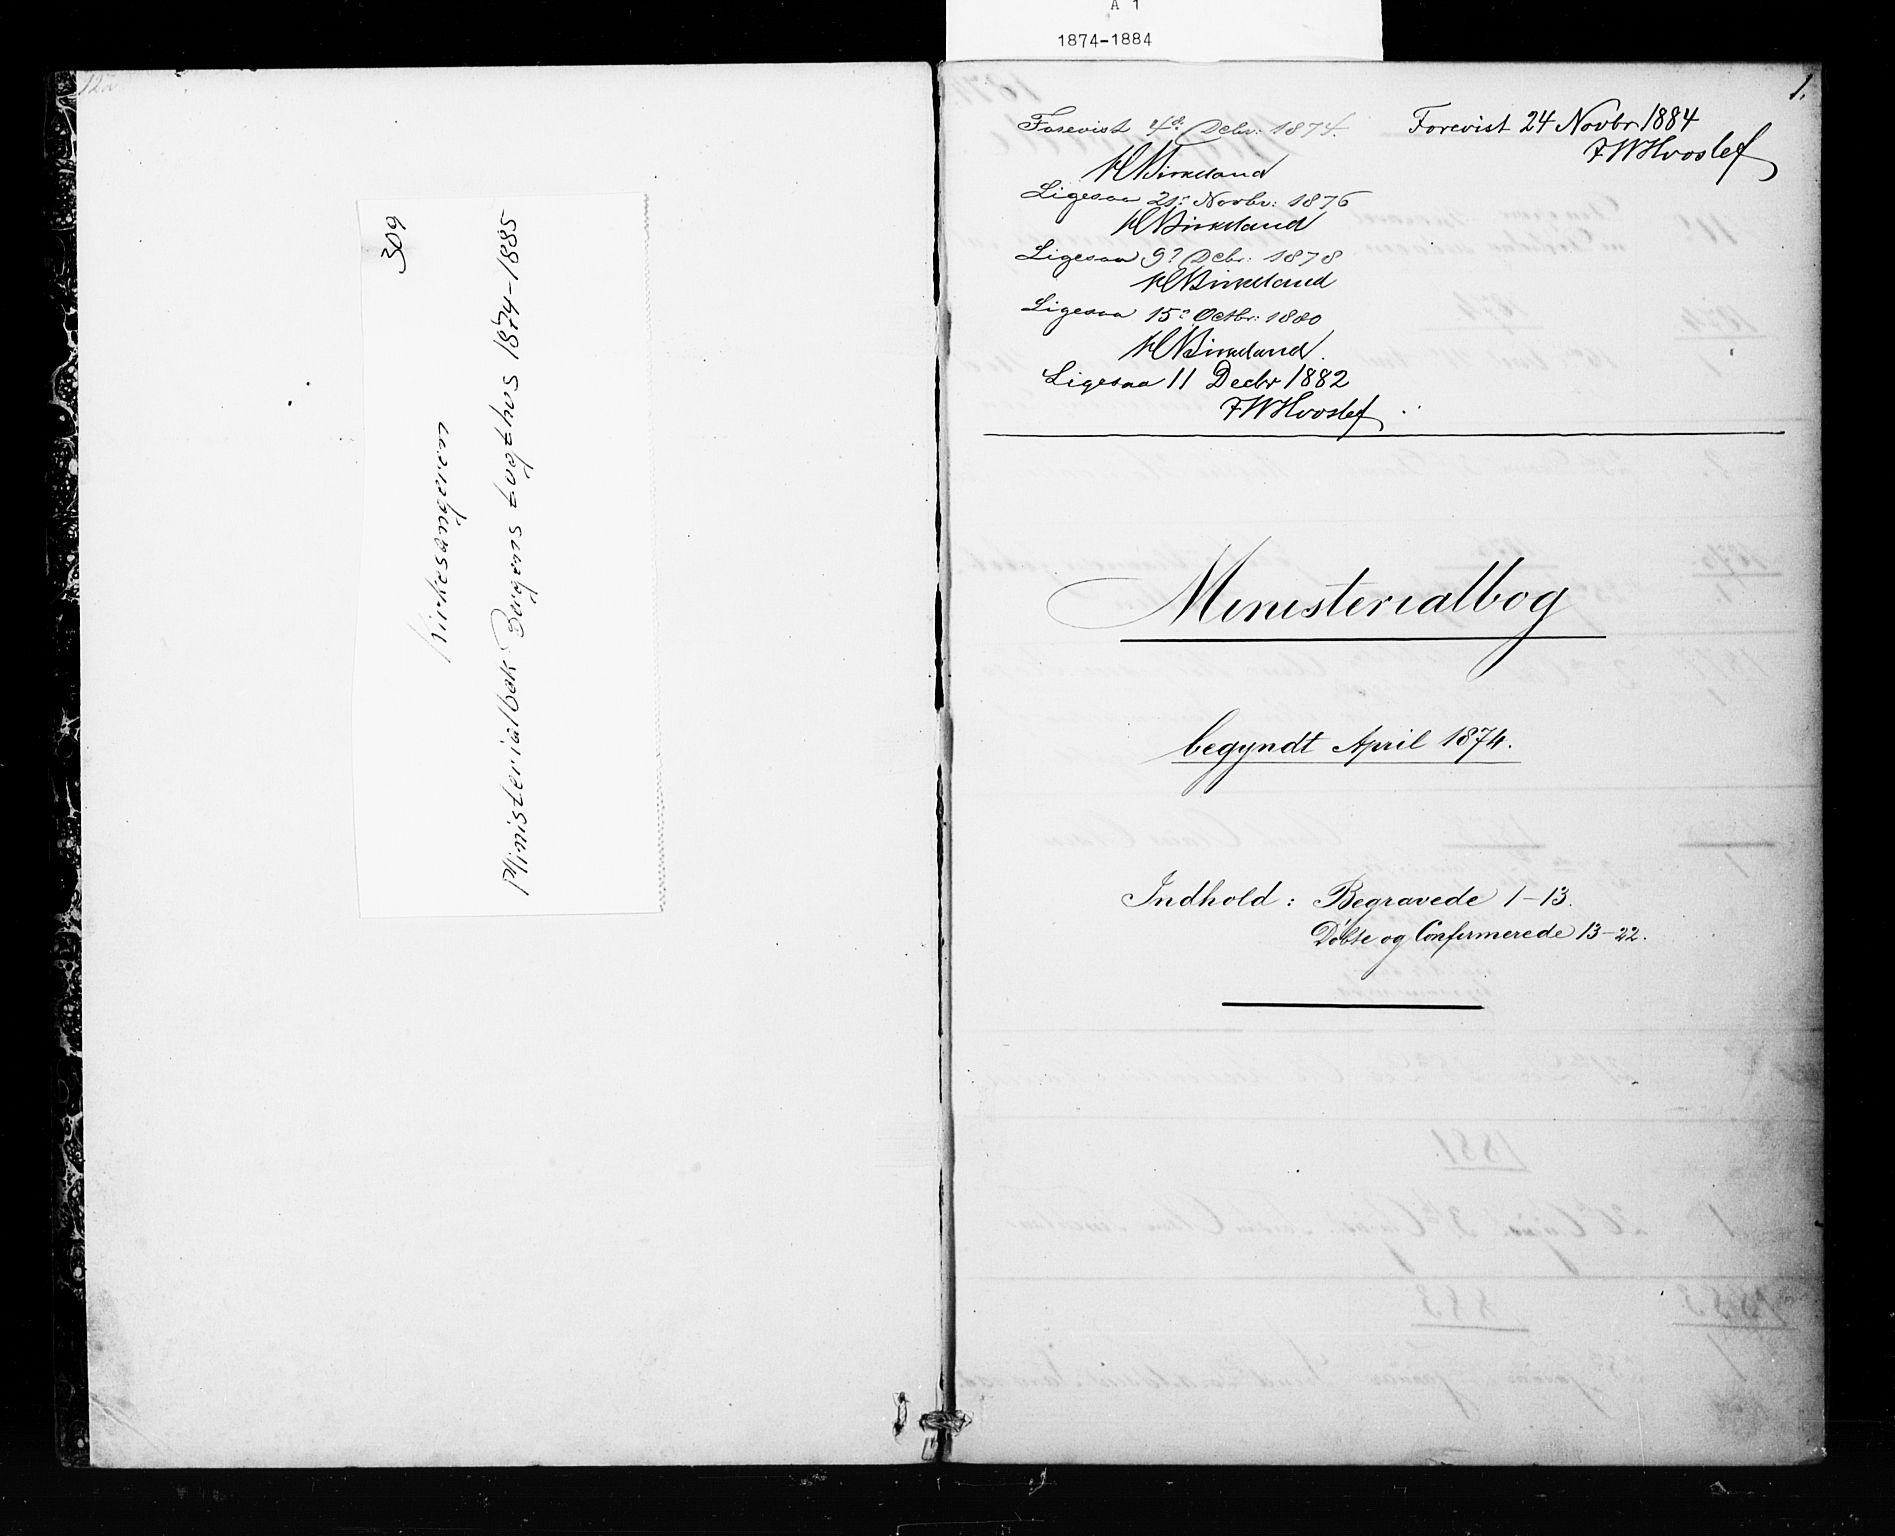 SAB, Bergens strafanstalts sokneprestembete*, Parish register (copy) no. A 1, 1874-1884, p. 1